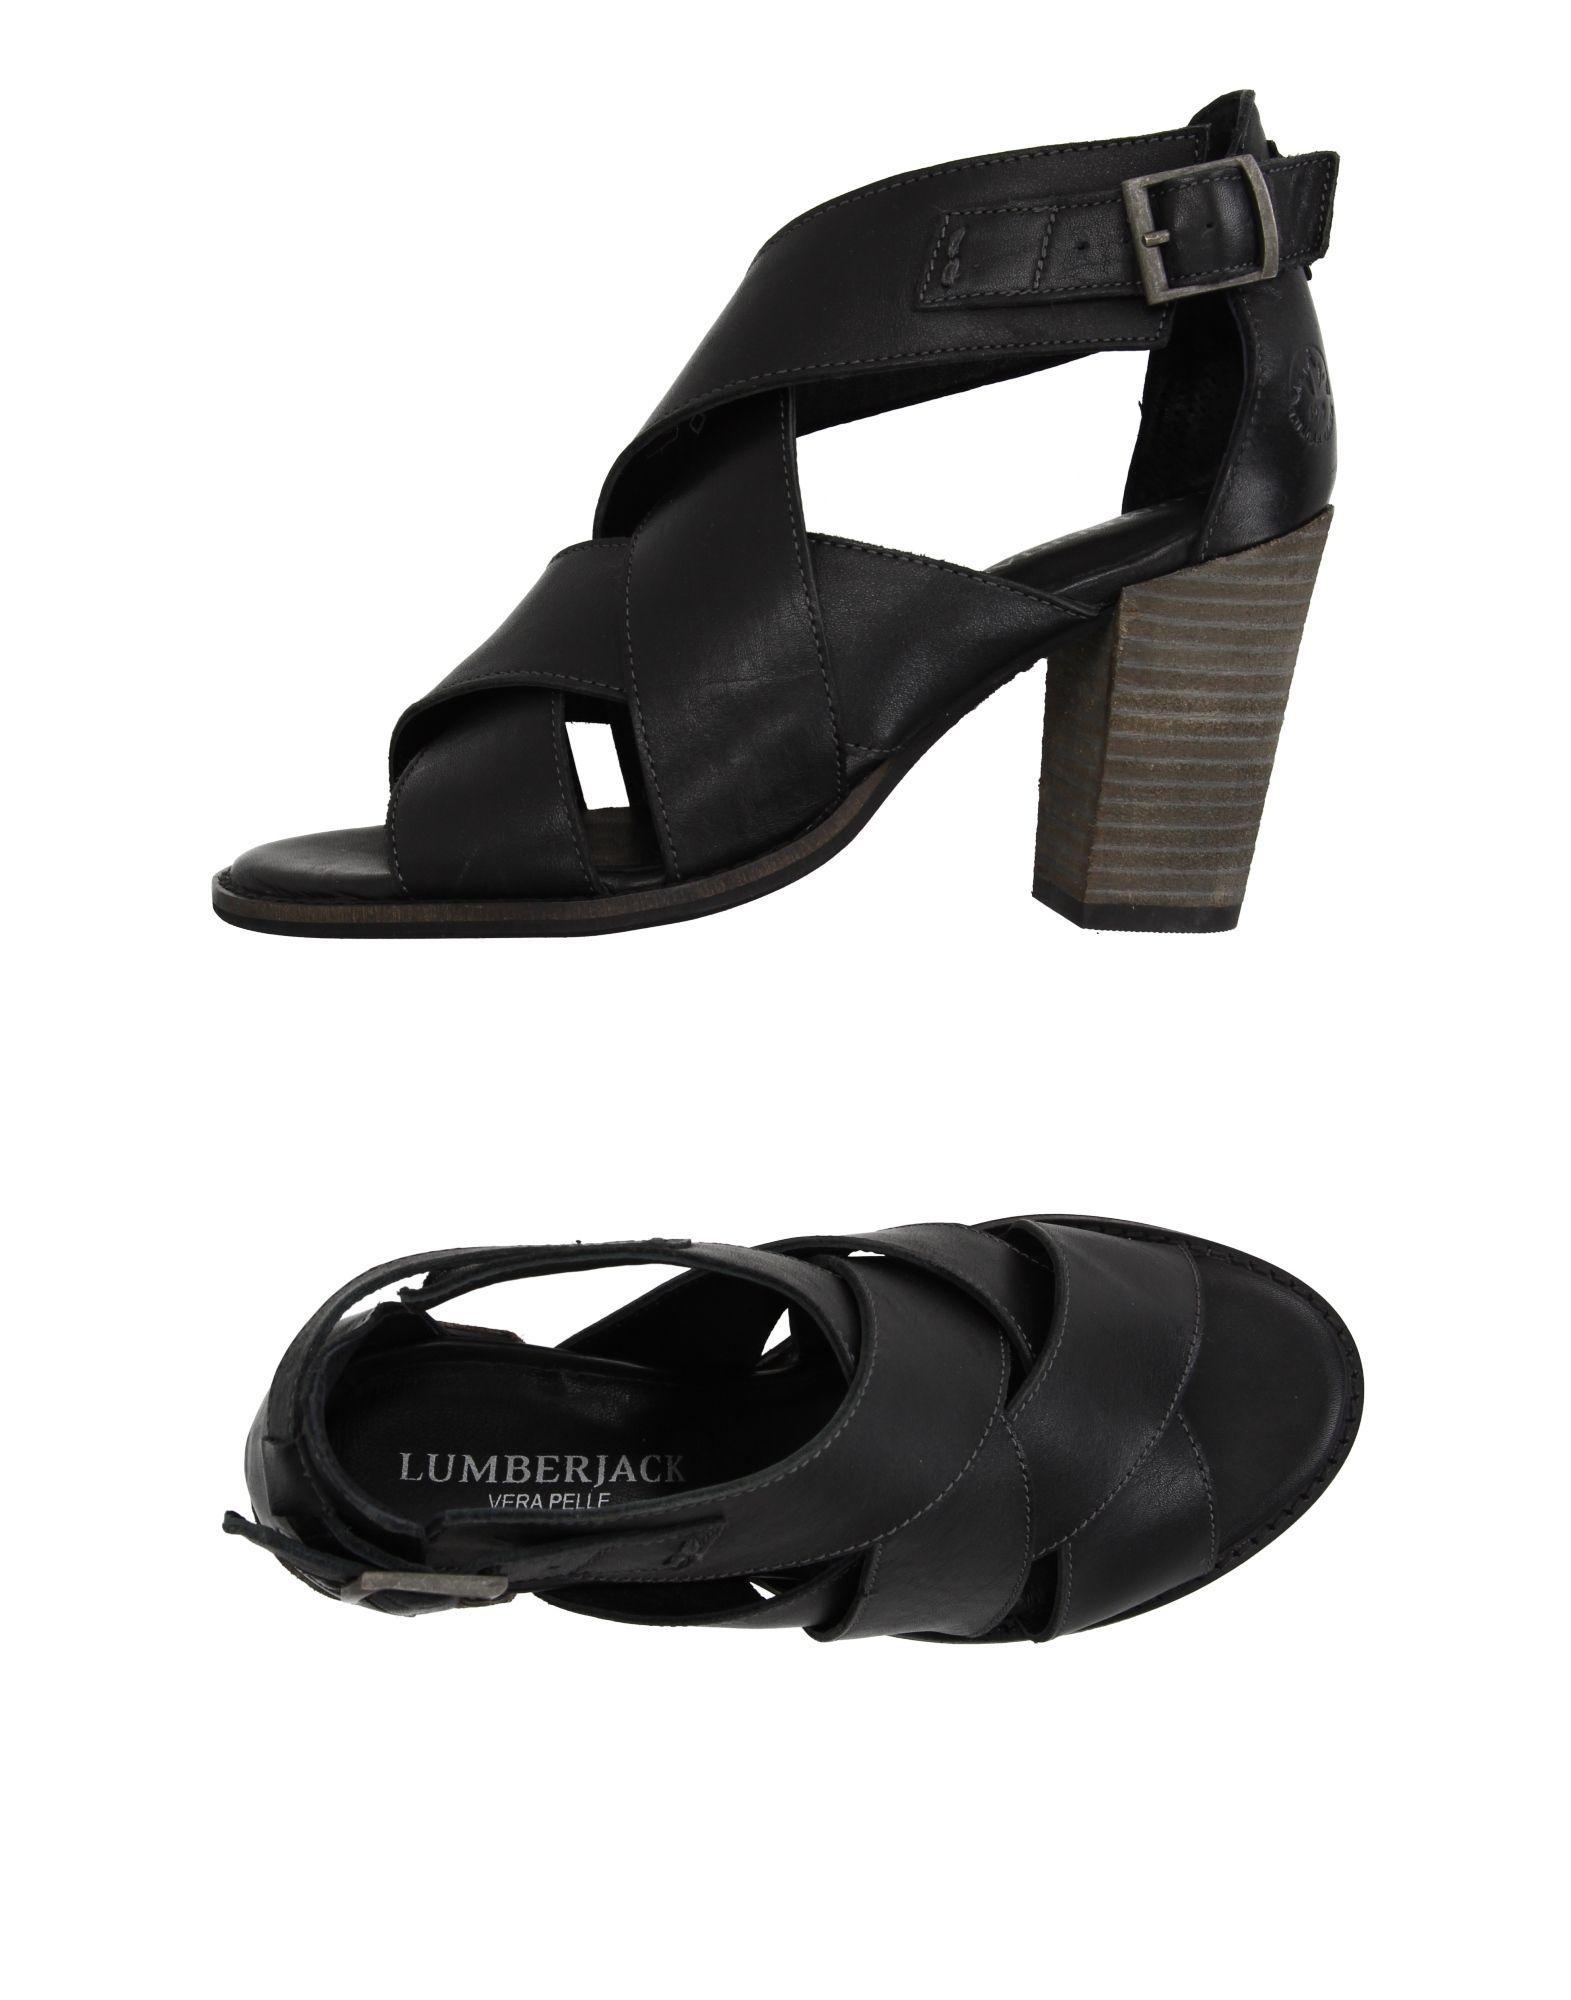 LUMBERJACK Damen Sandale Farbe Schwarz Größe 3 jetztbilligerkaufen